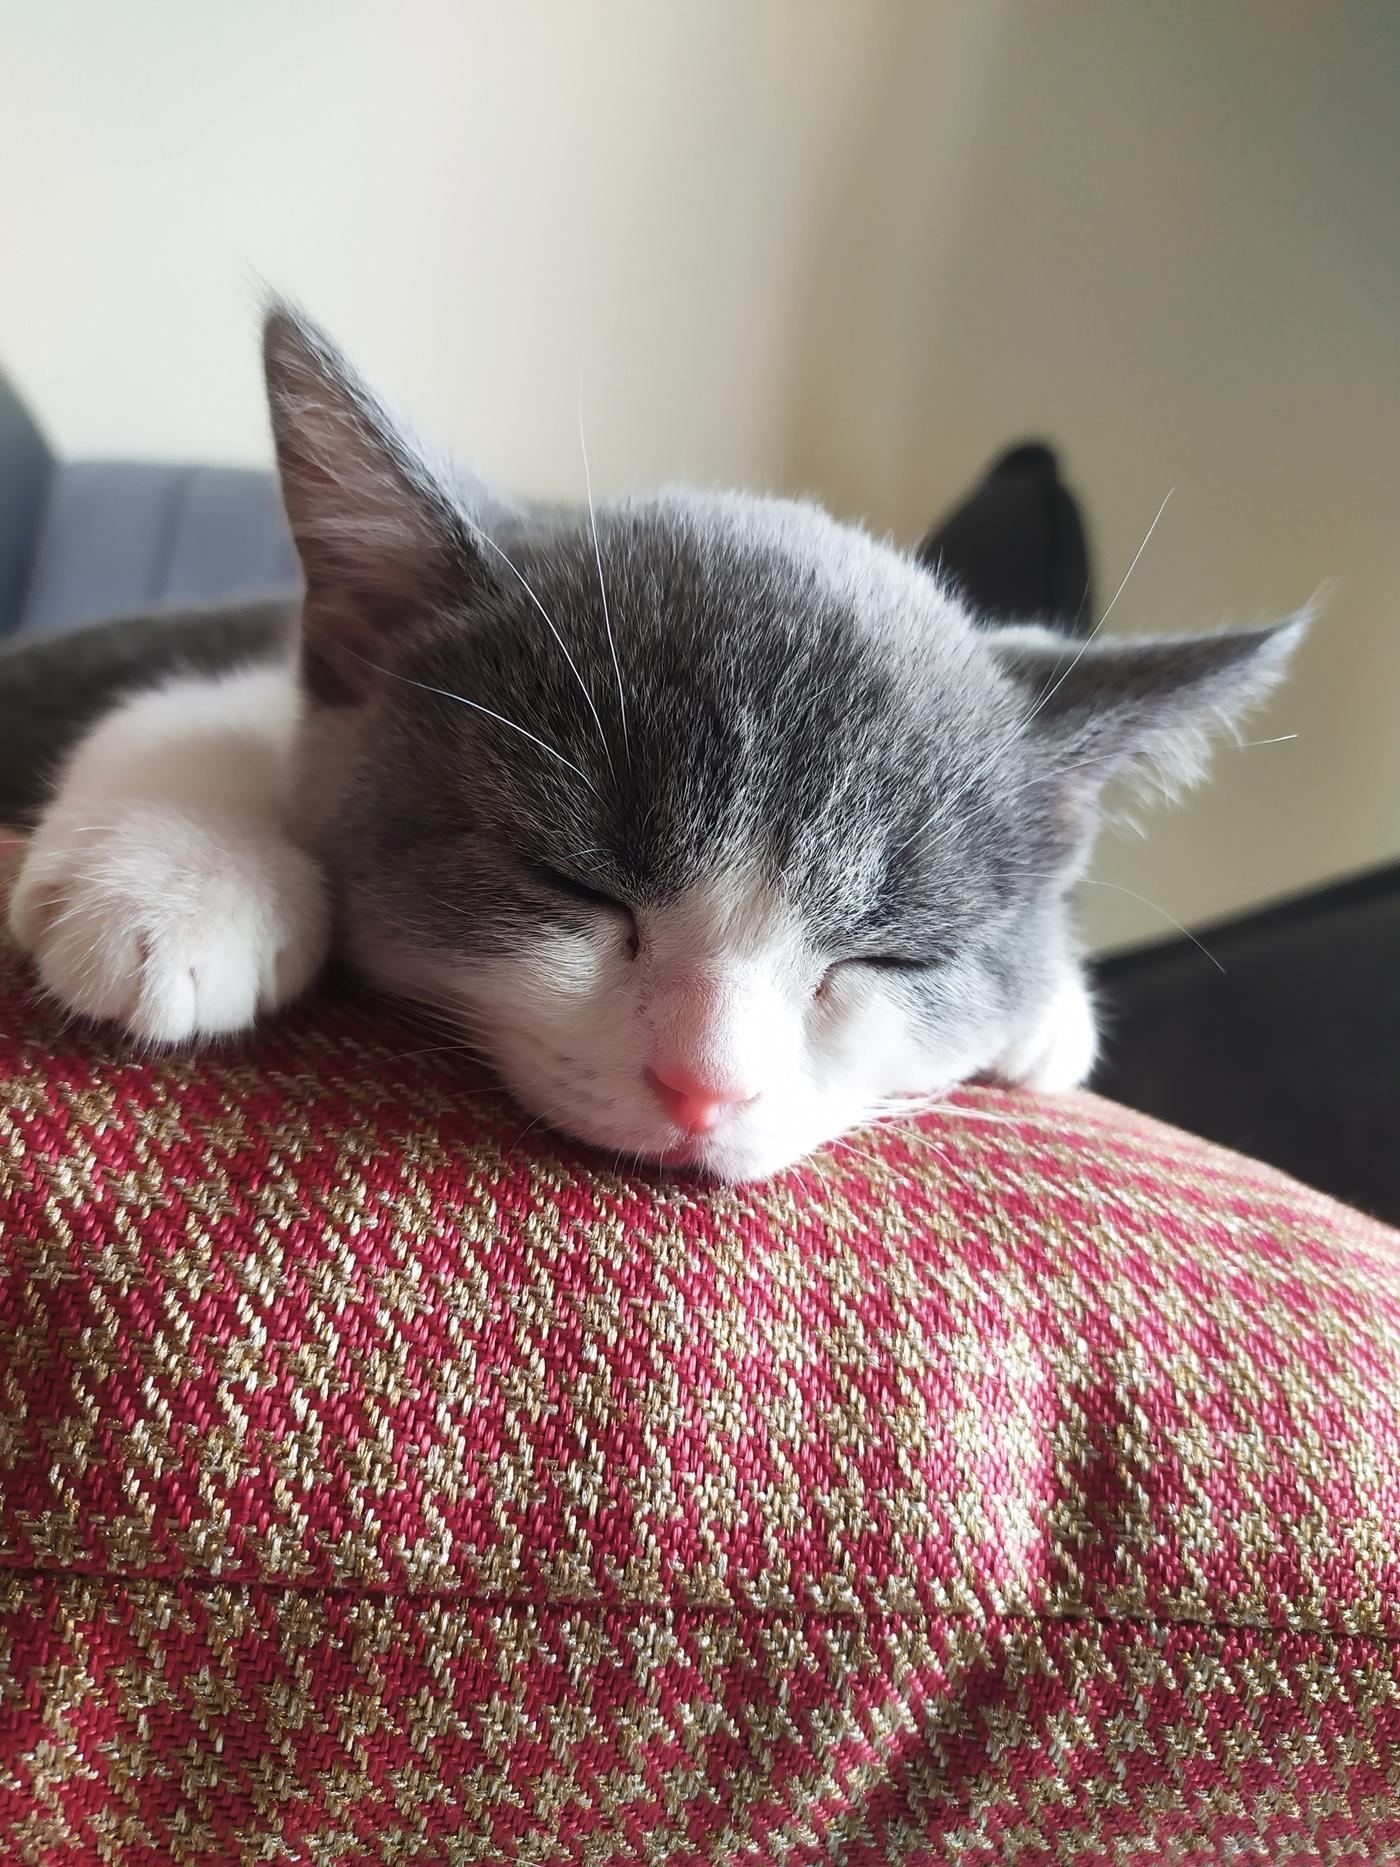 Cute Sleeping Kitten